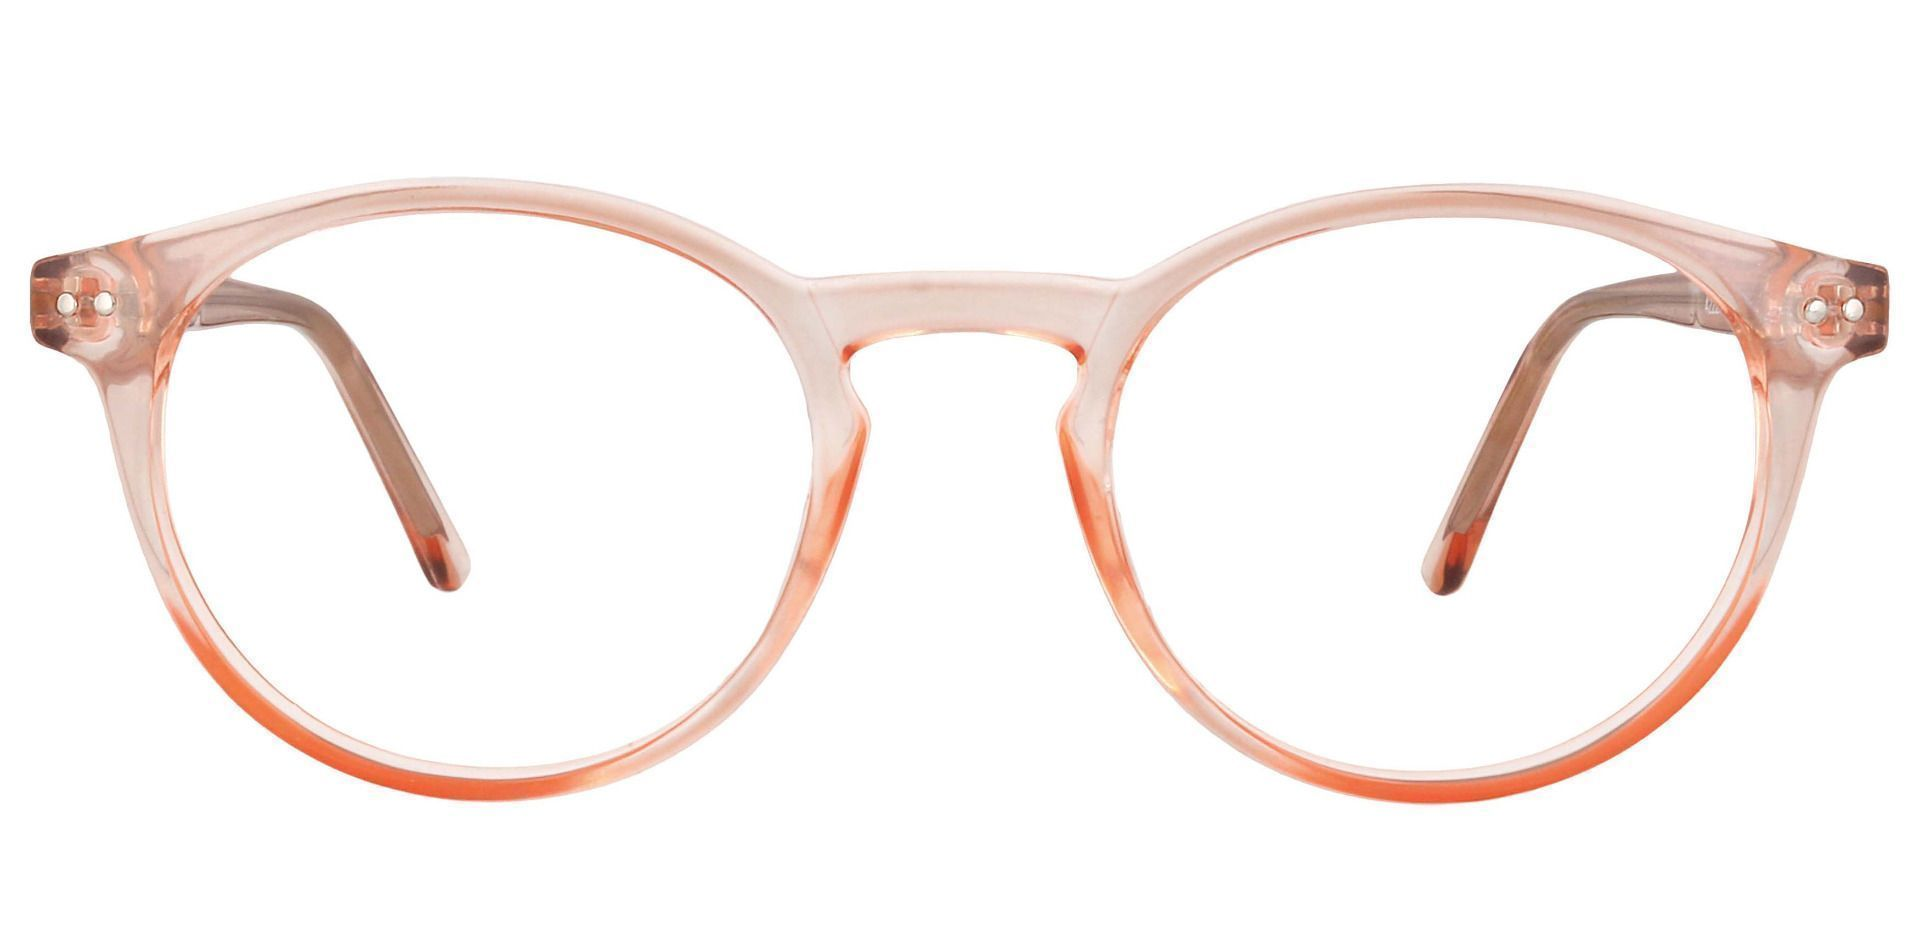 Harmony Oval Prescription Glasses - Pink